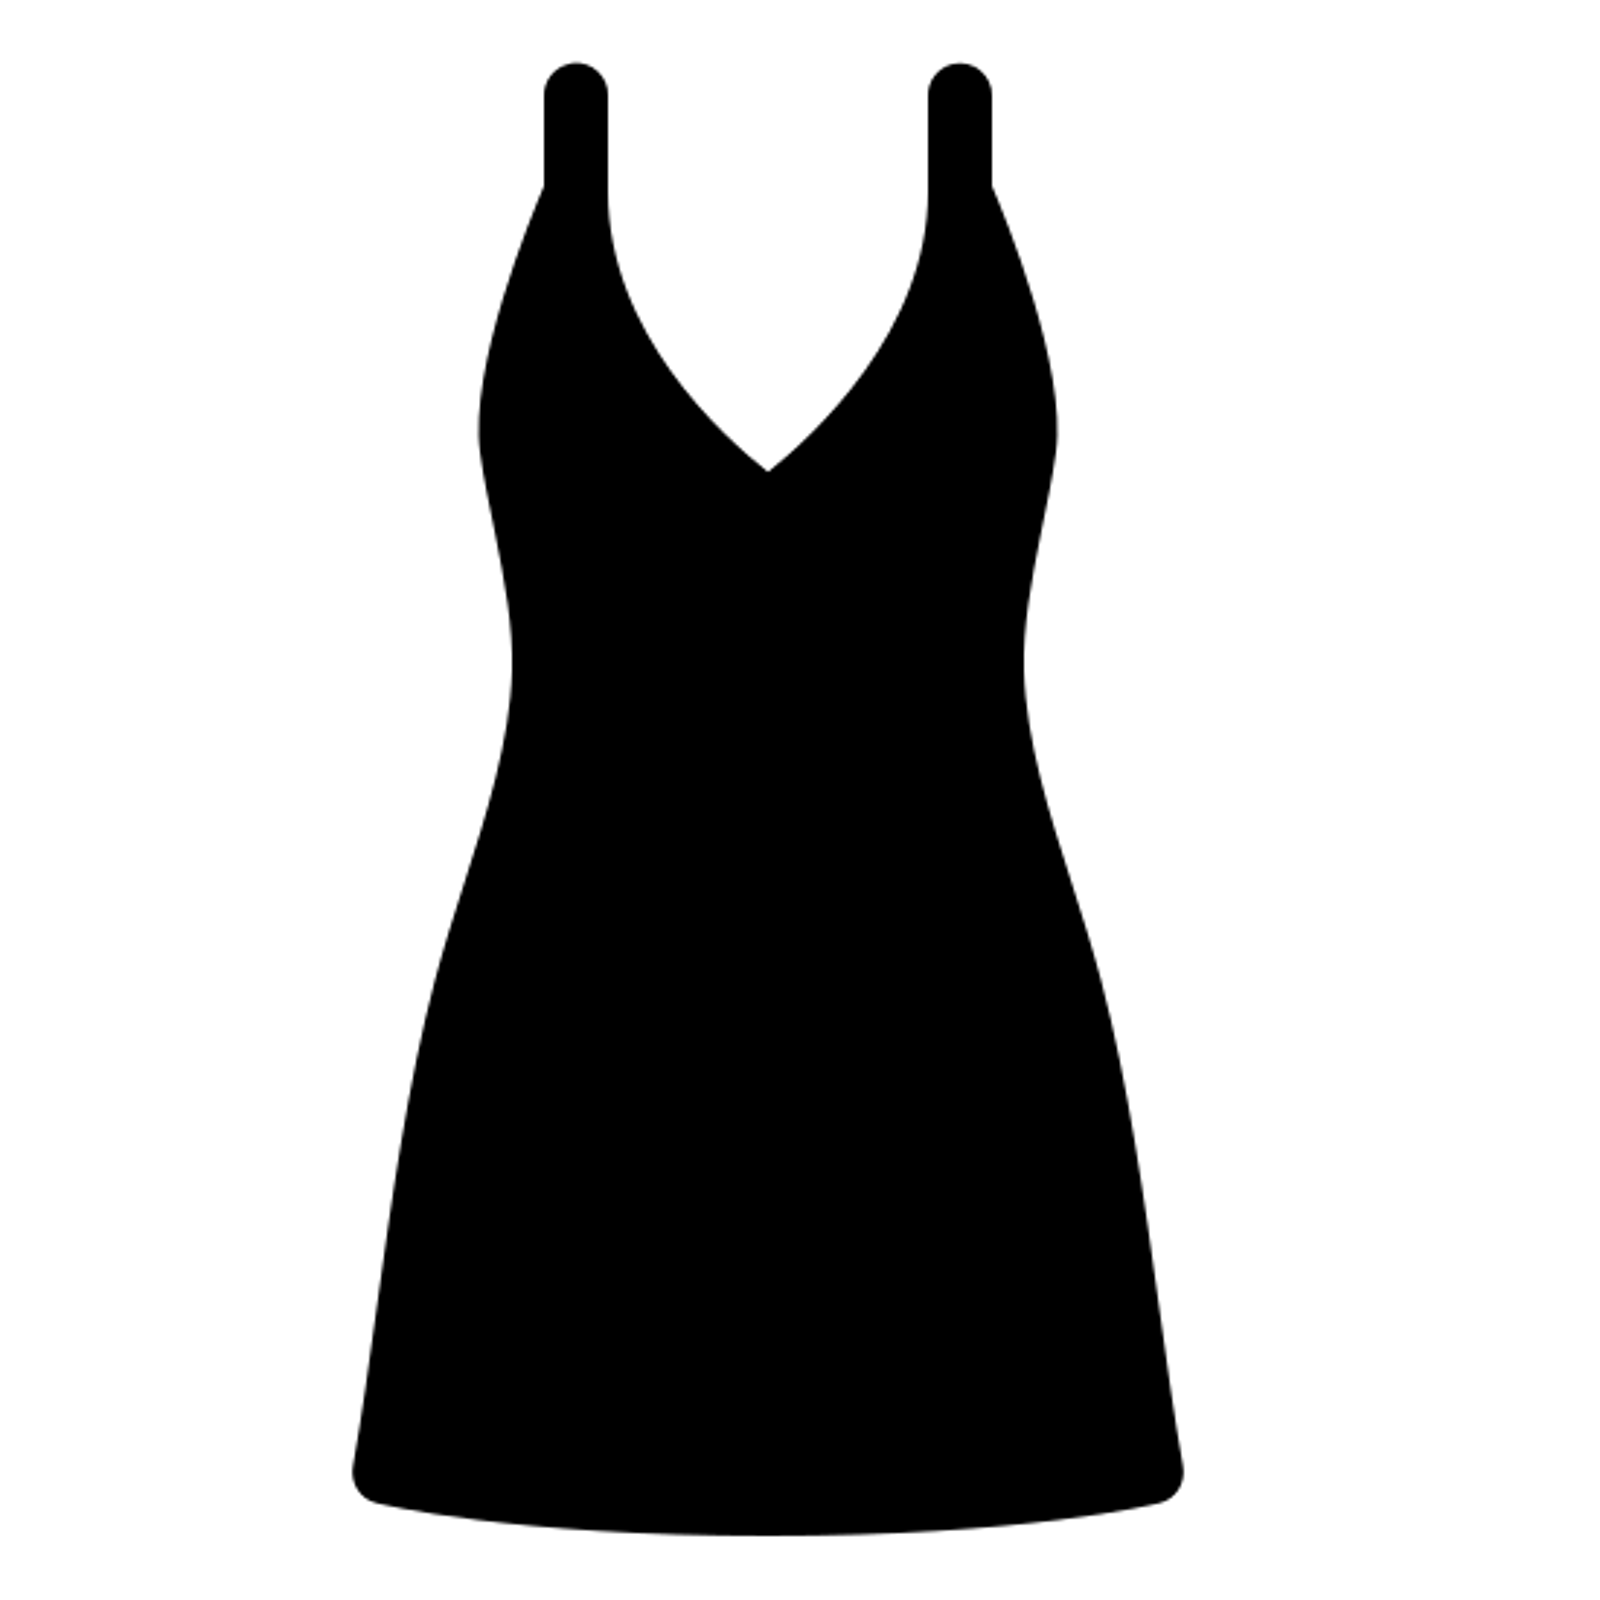 Slip Dress Filled icon